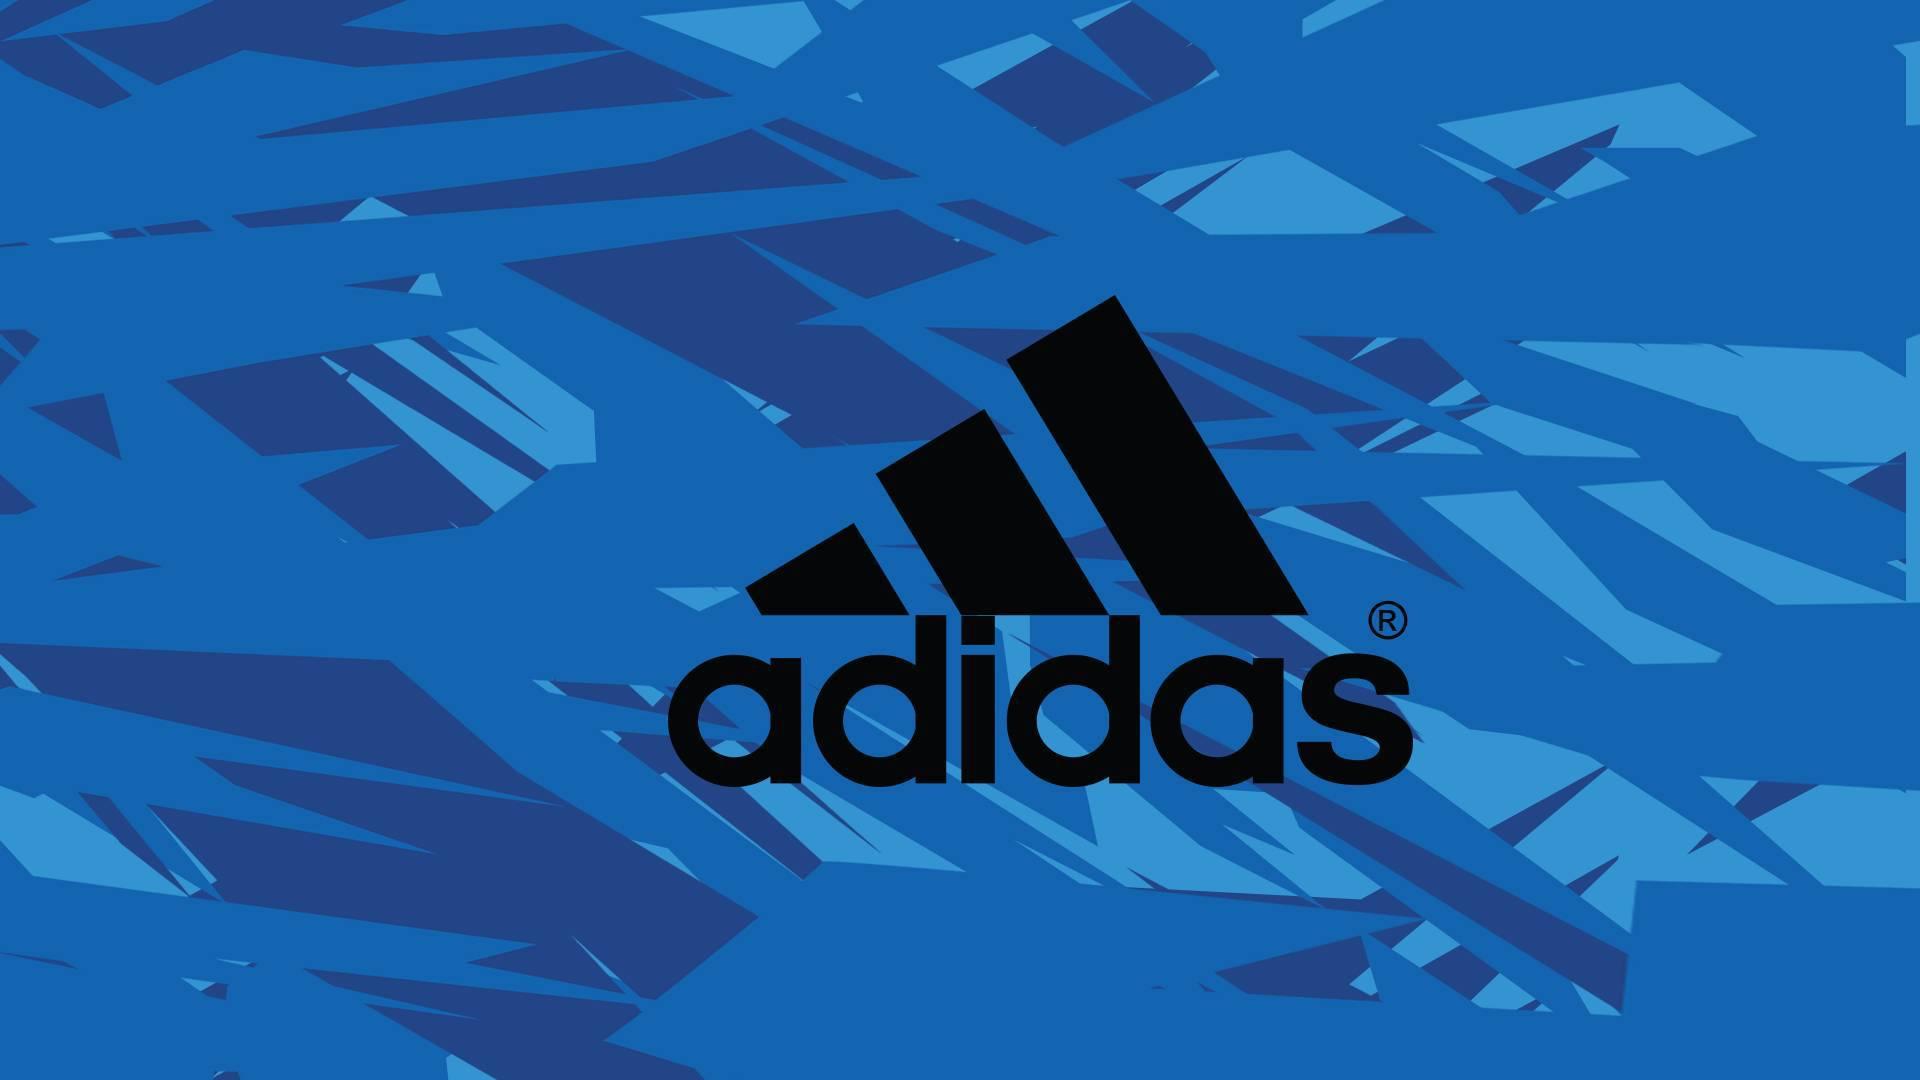 Adidas Wallpaper 04 1920x1080 768x432. Download